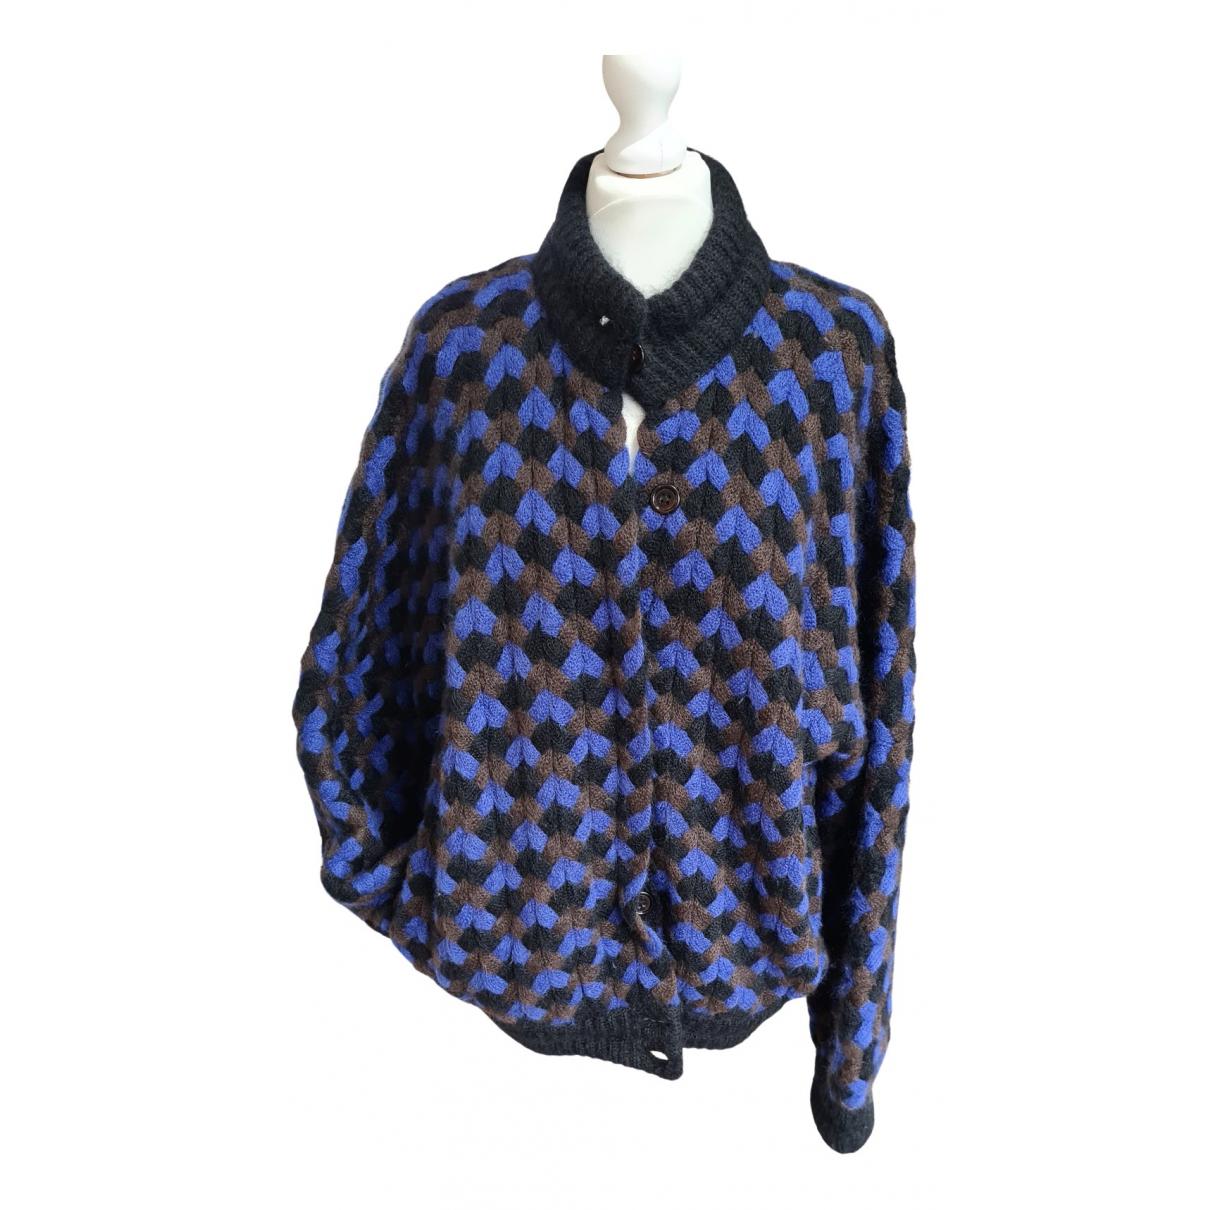 Salvatore Ferragamo \N Pullover in  Blau Wolle